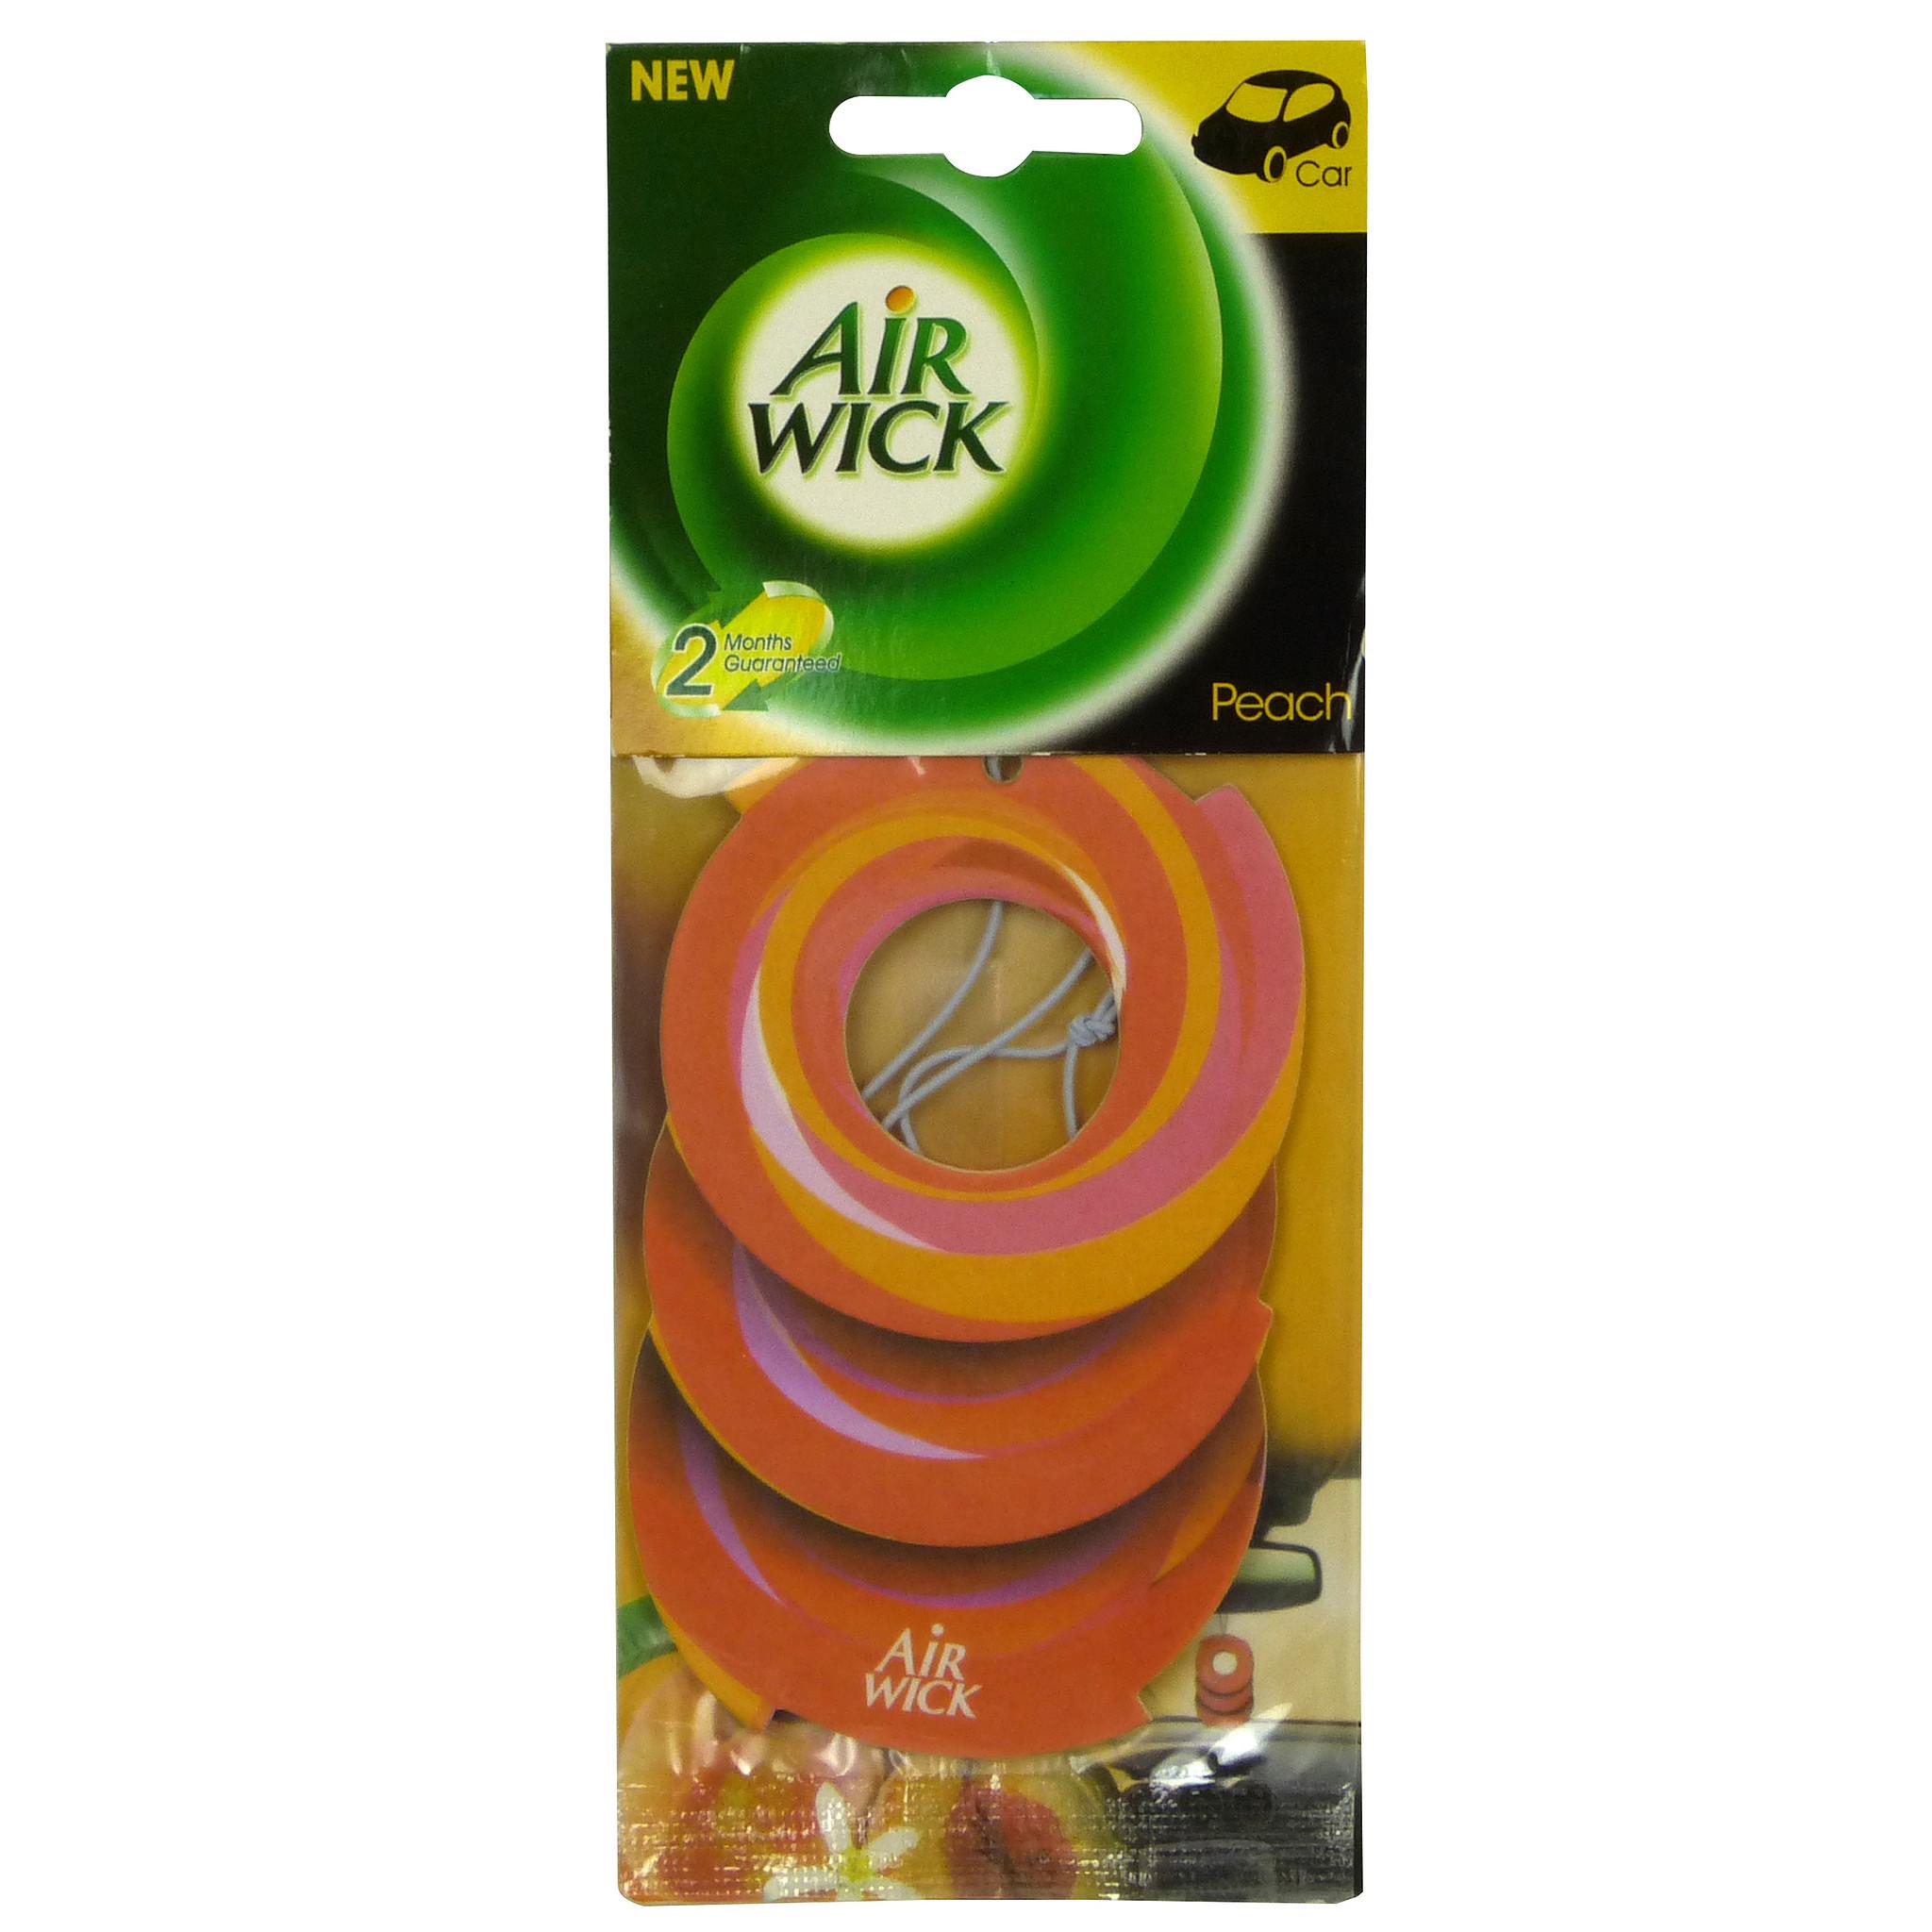 Airwick Luchtverfrisser Circle Perzik & Sinaasappel